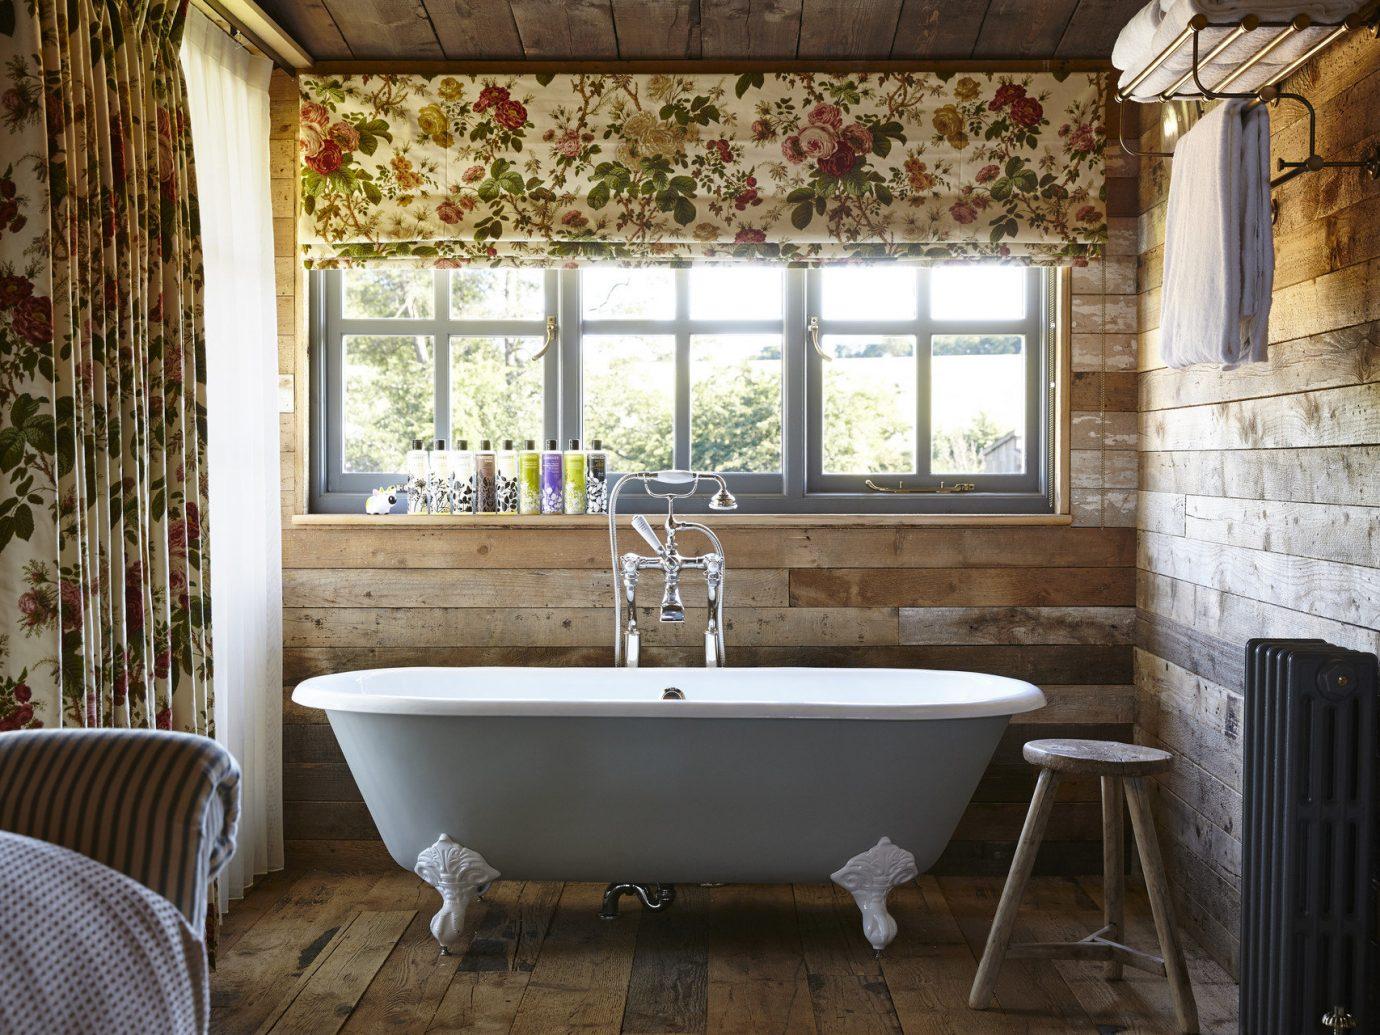 Trip Ideas window floor indoor chair room property tub estate house bathroom home interior design cottage farmhouse real estate bathtub furniture Bath